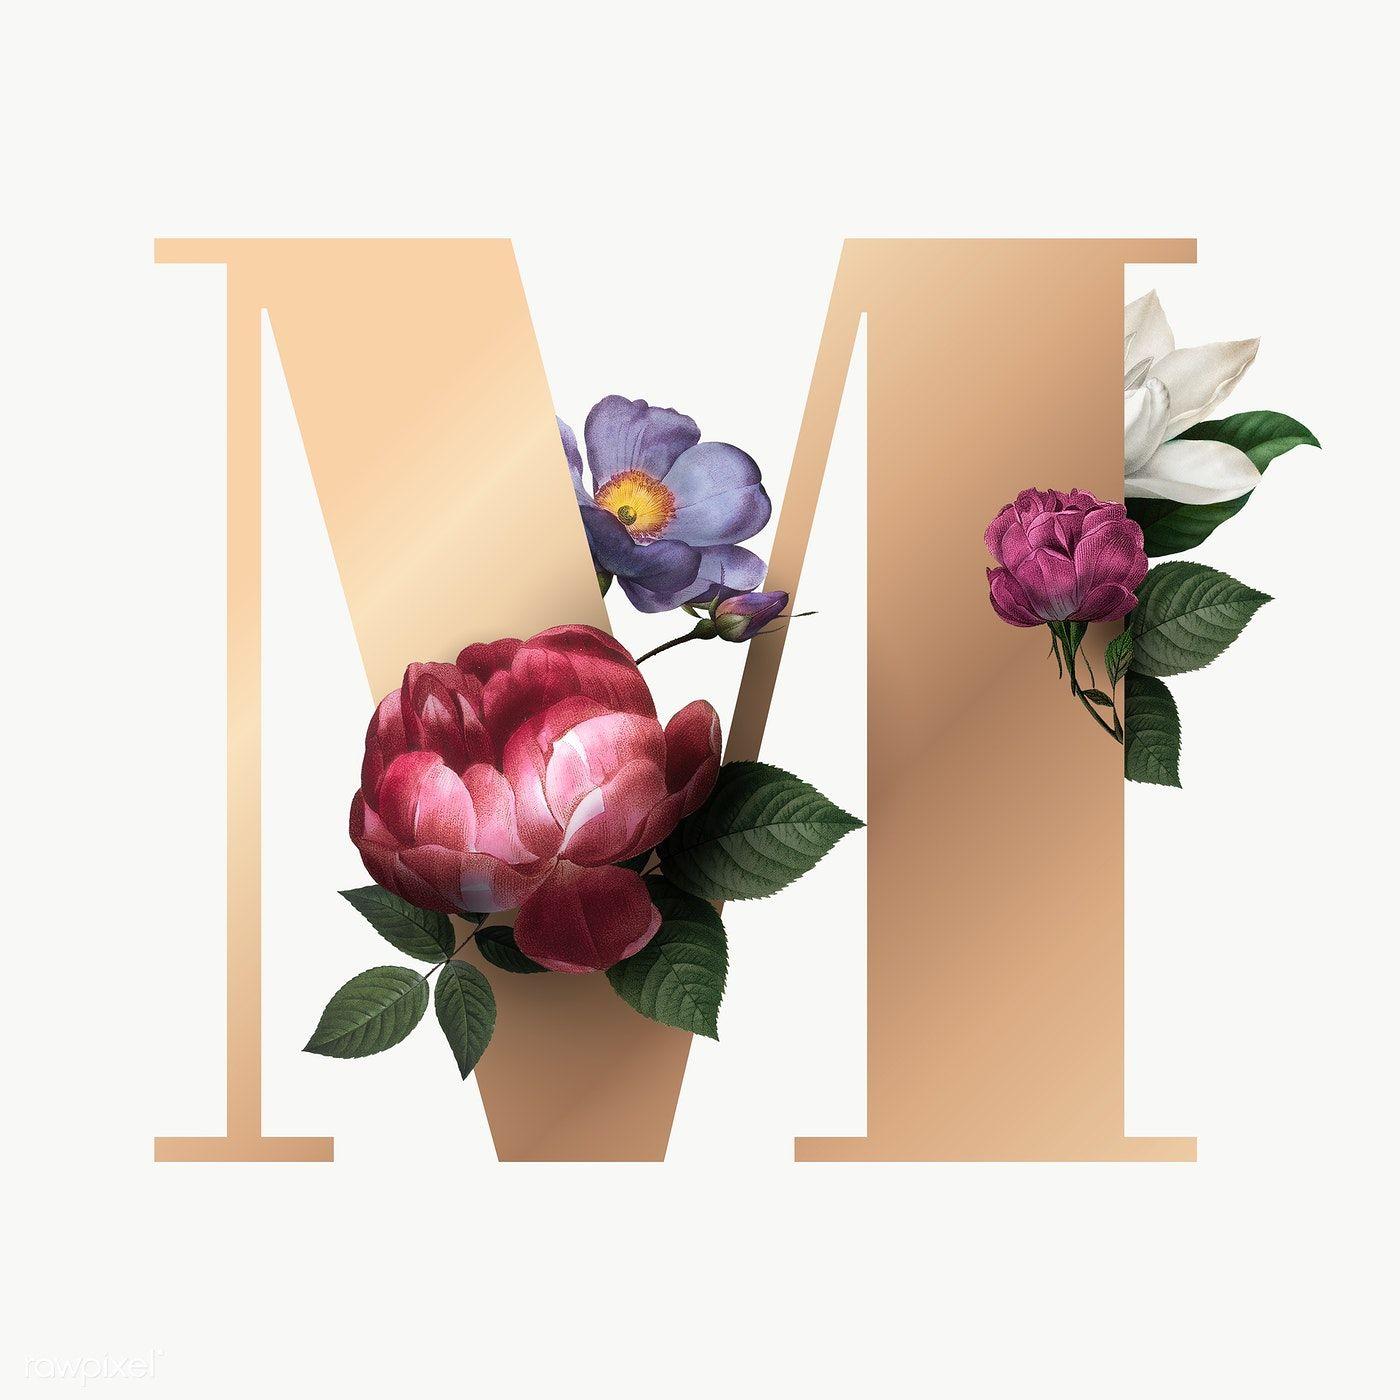 Classic And Elegant Floral Alphabet Font Letter M Transparent Png Free Image By Rawpixel Com Lettering Alphabet Fonts Floral Typography Lettering Fonts